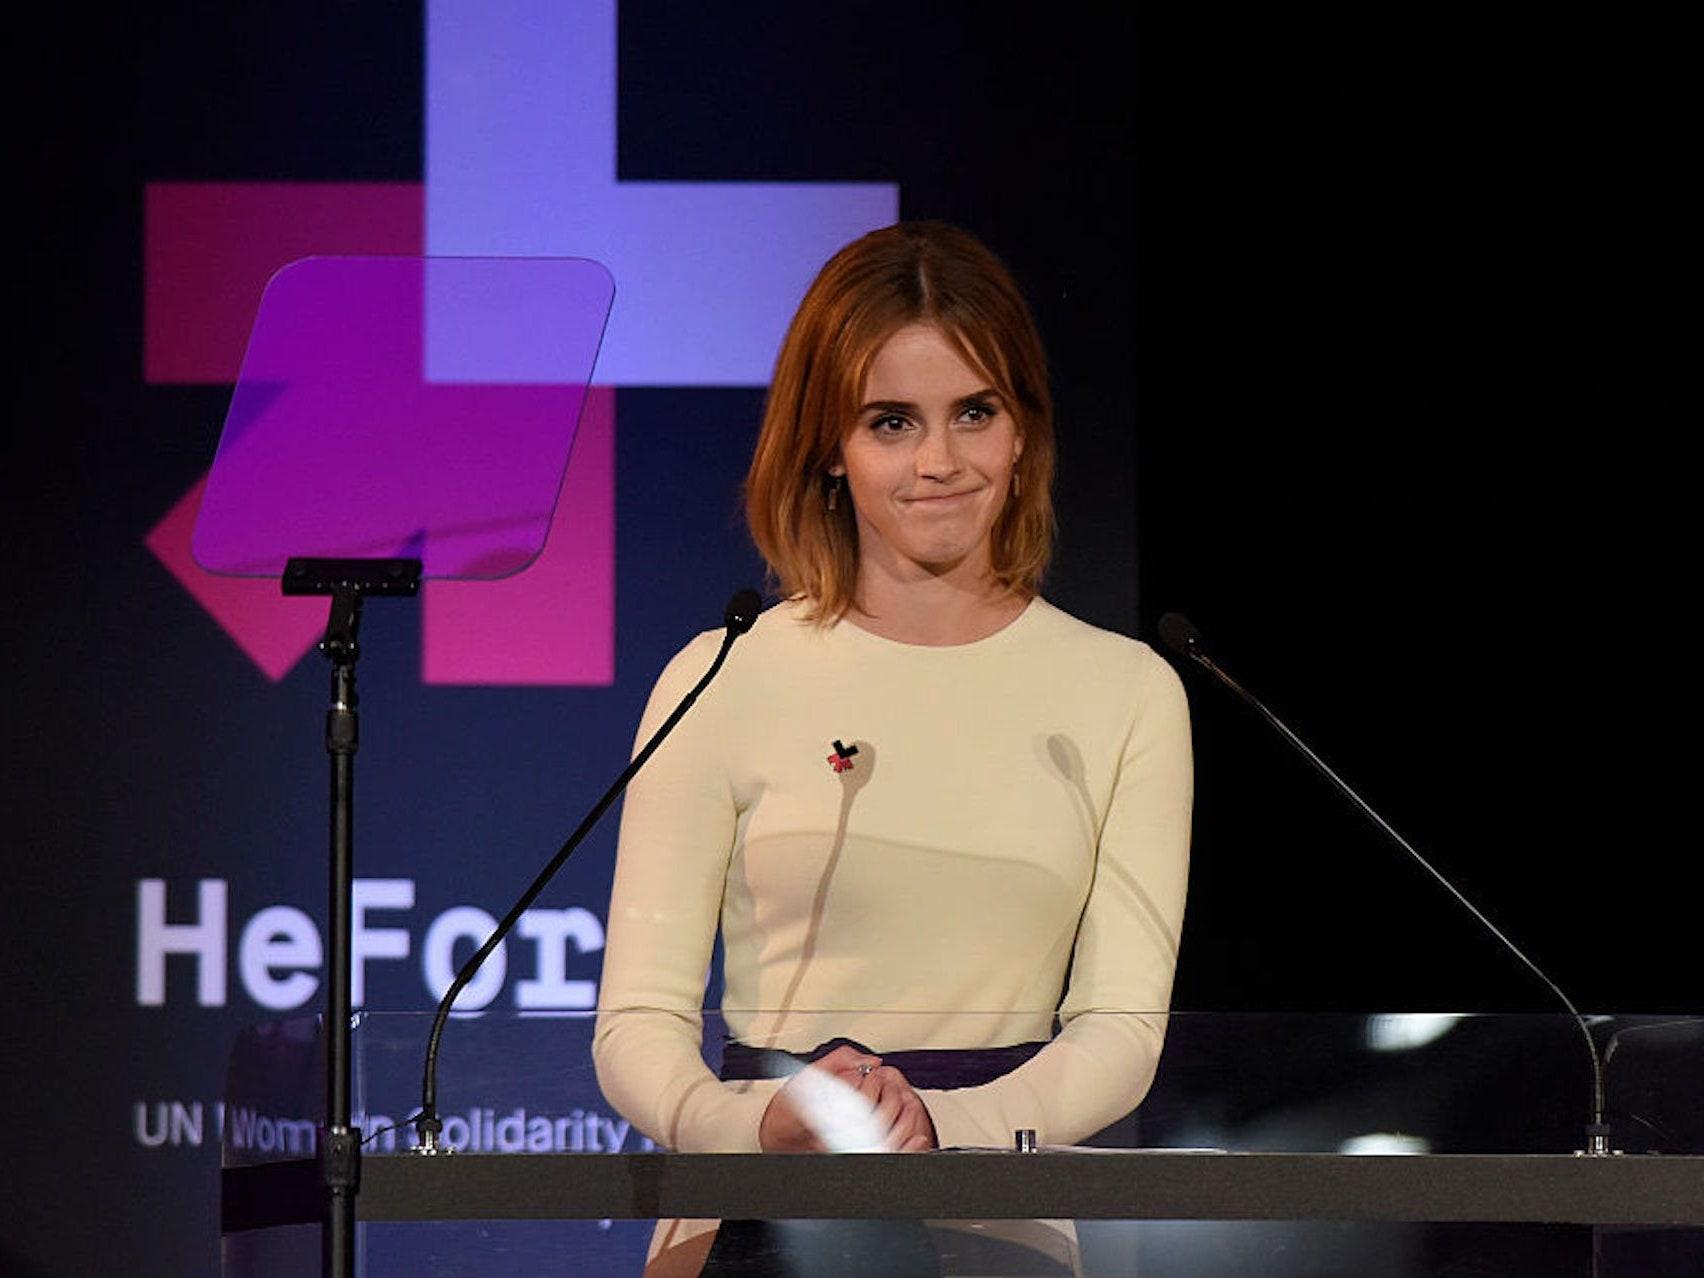 Emma Watson Icloud Leak photo 5